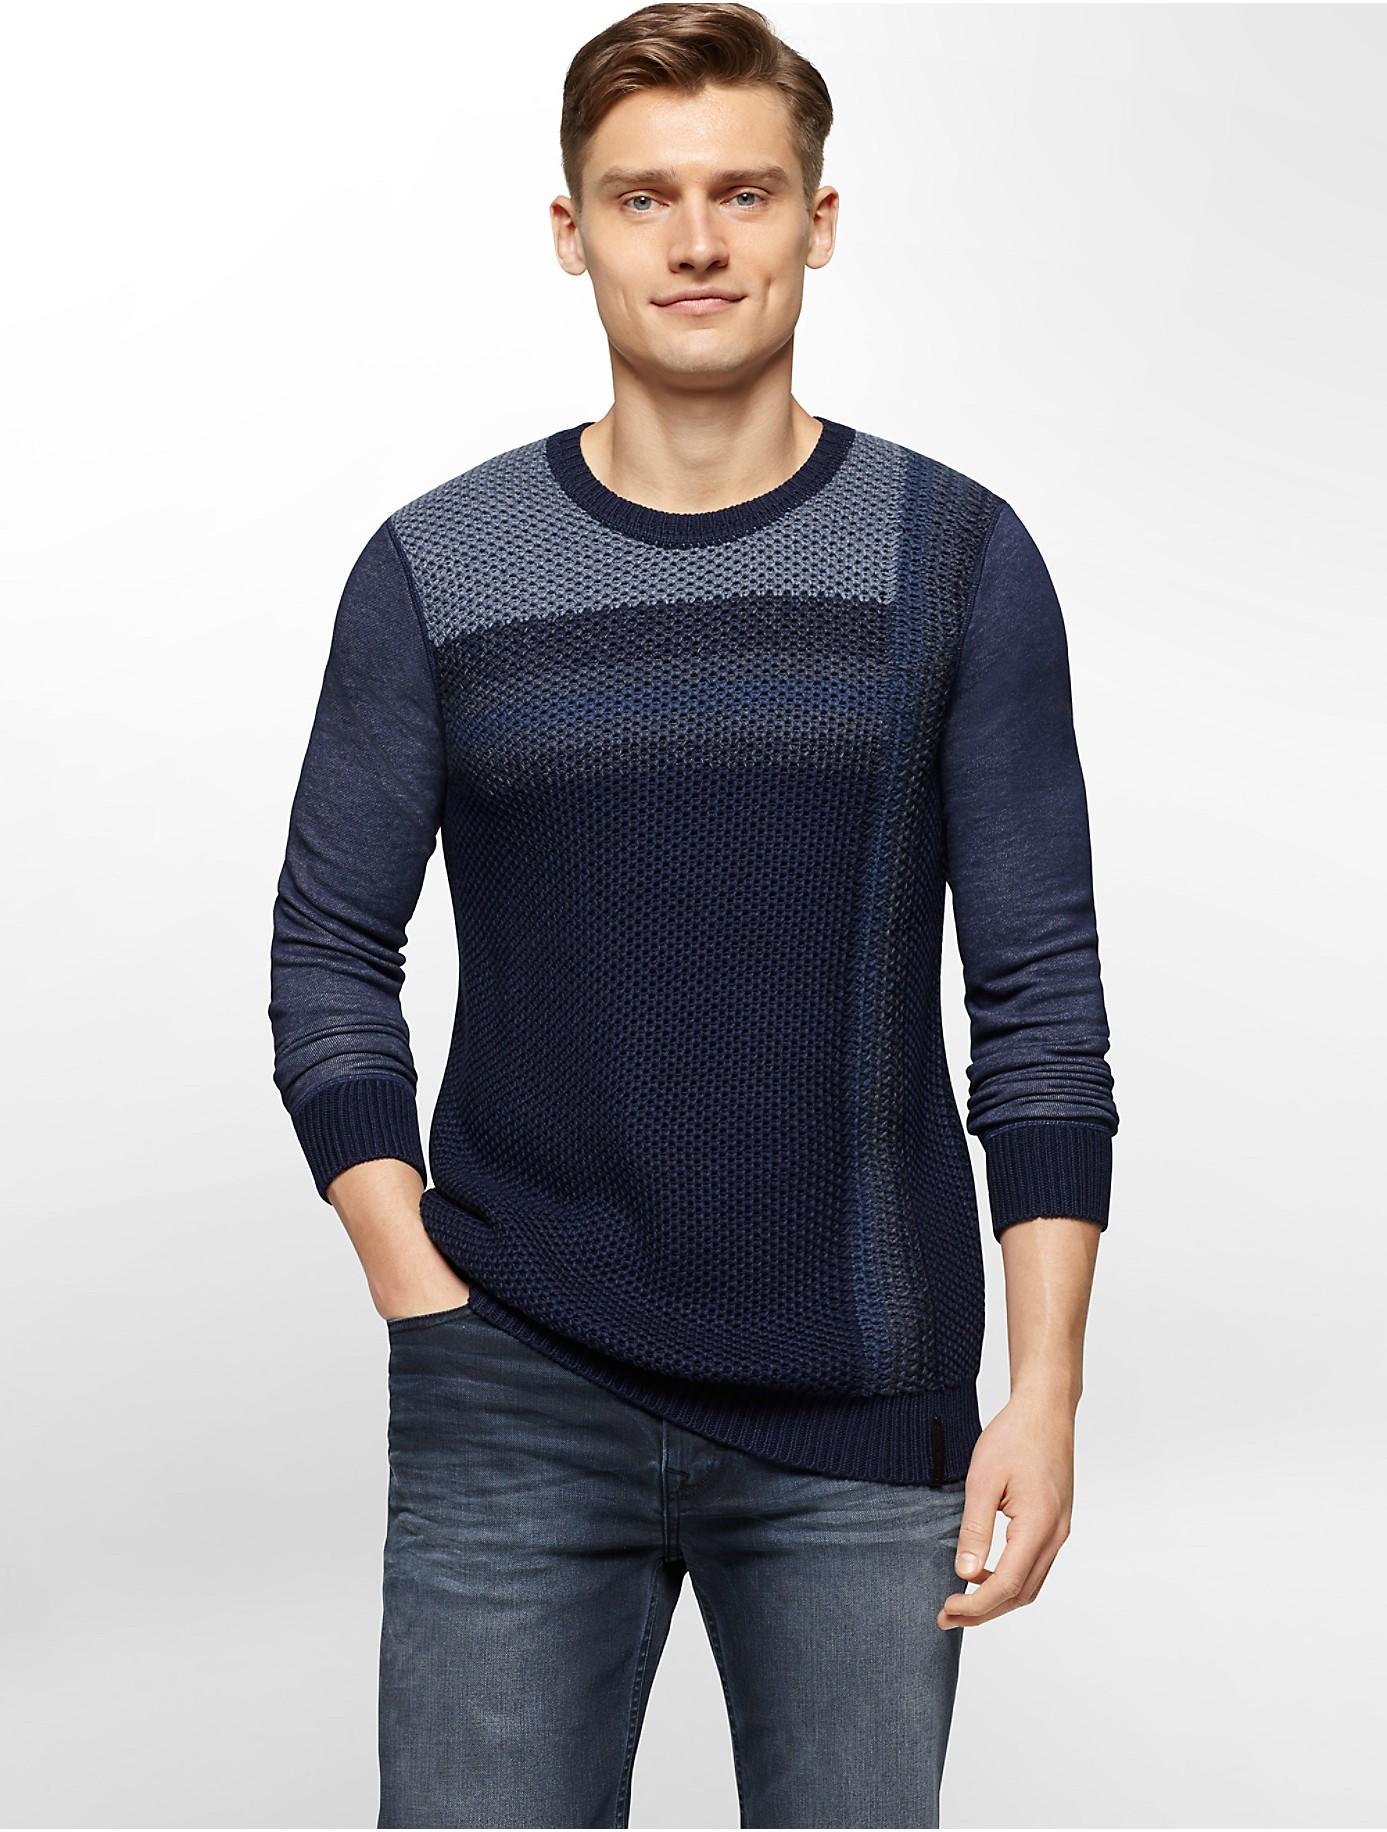 lyst calvin klein jeans vertical ombre knit sweater for men. Black Bedroom Furniture Sets. Home Design Ideas